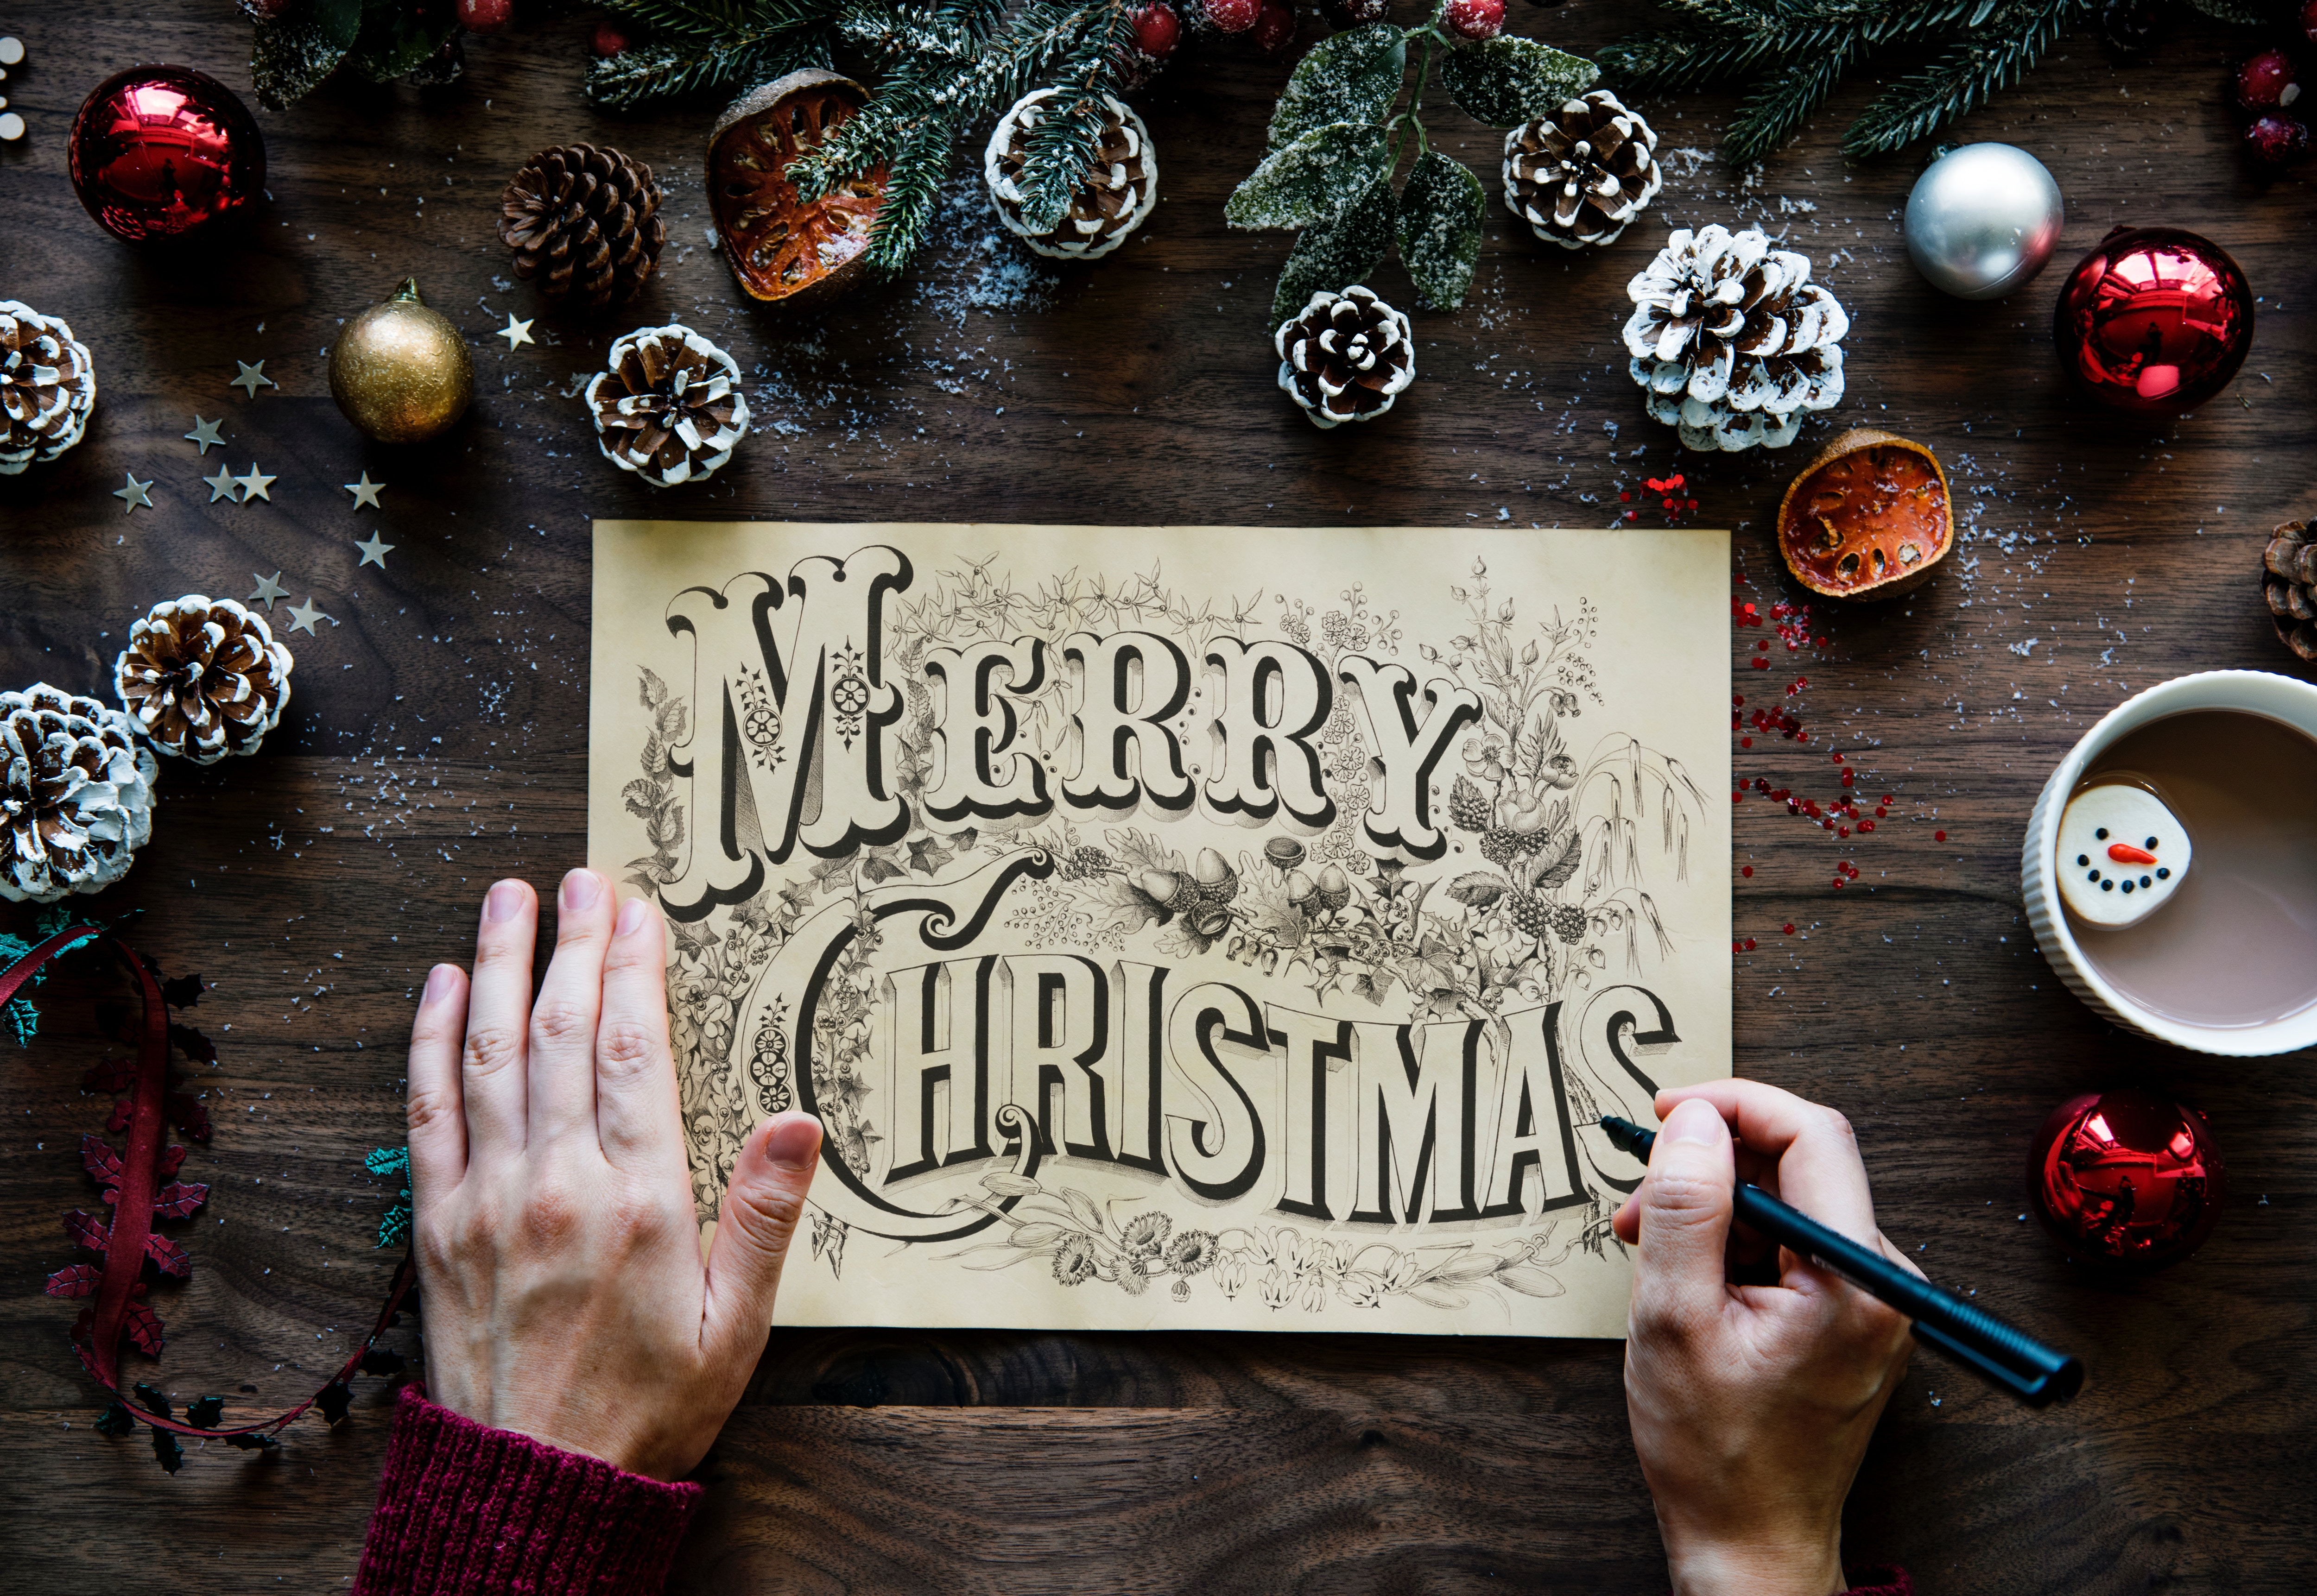 Llandudno Christmas Fayre 2017